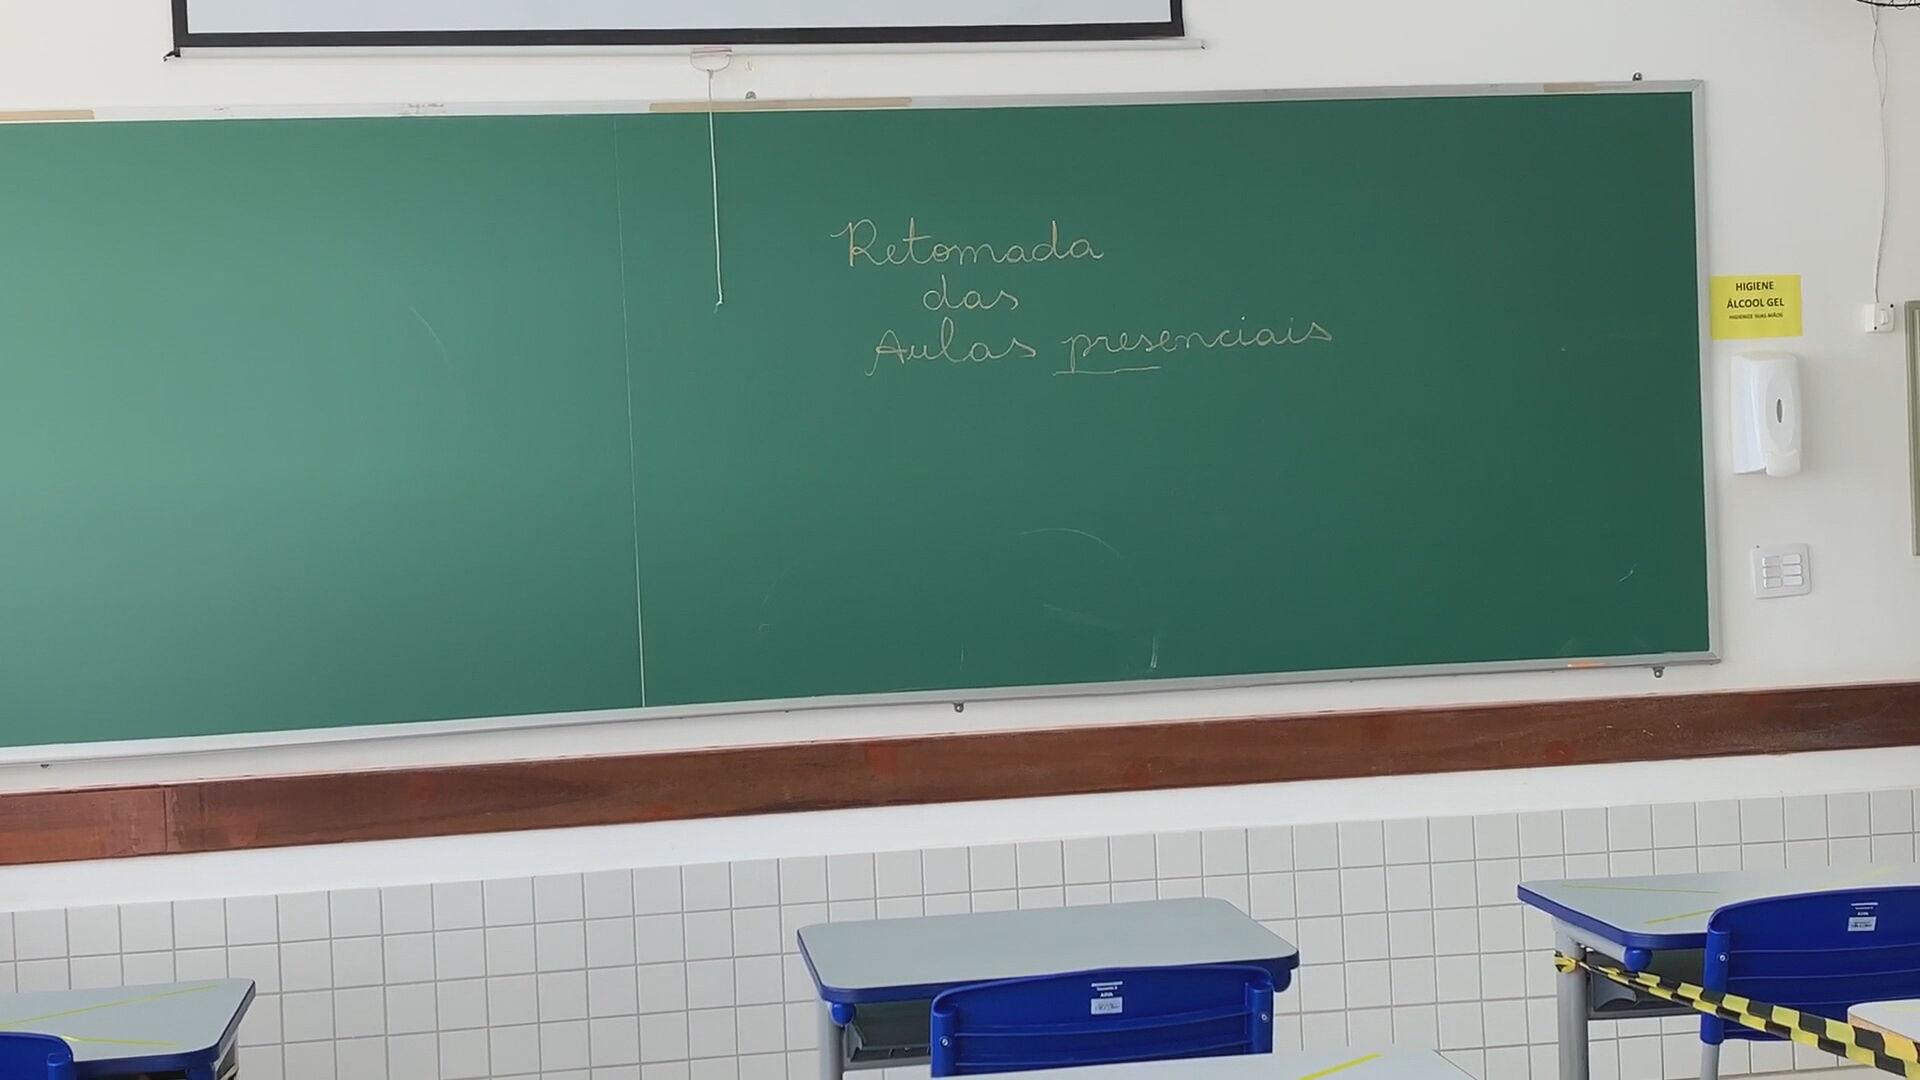 Lousa de colégio indicando o retorno das aulas presenciais (06.jan.2021)